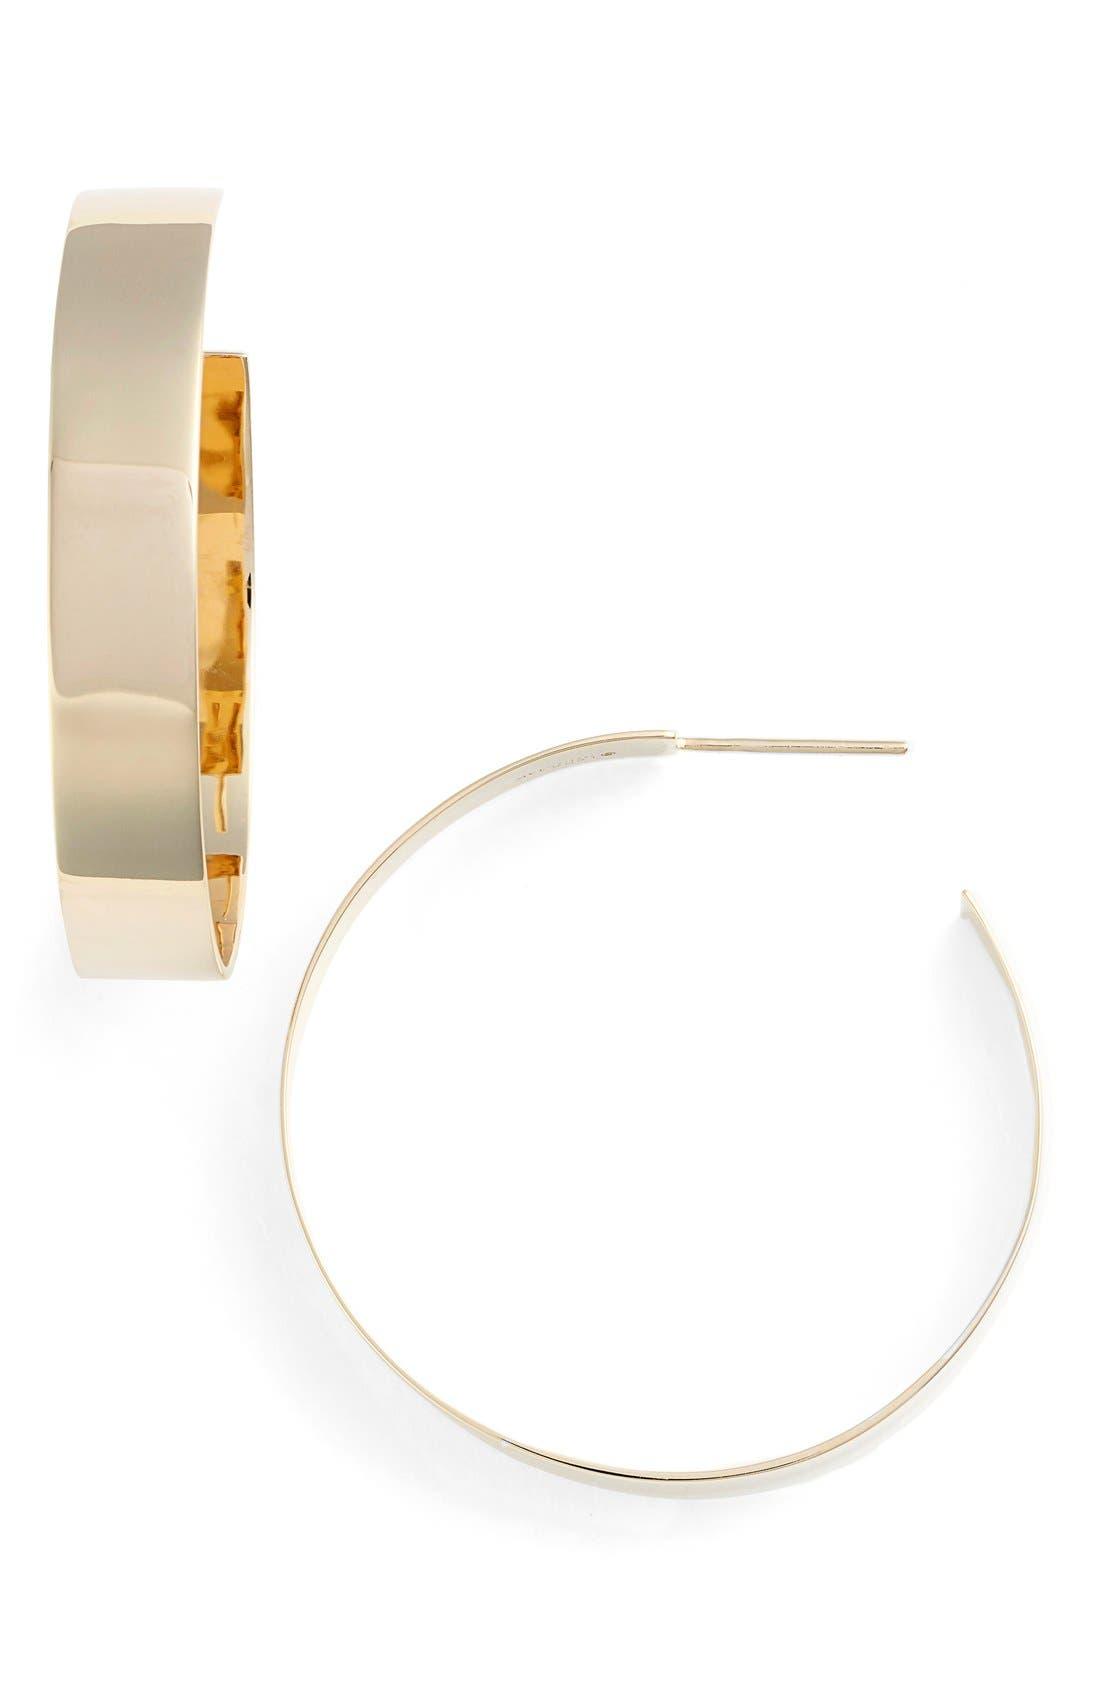 'Vanity' Small Hoop Earrings,                             Main thumbnail 1, color,                             YELLOW GOLD